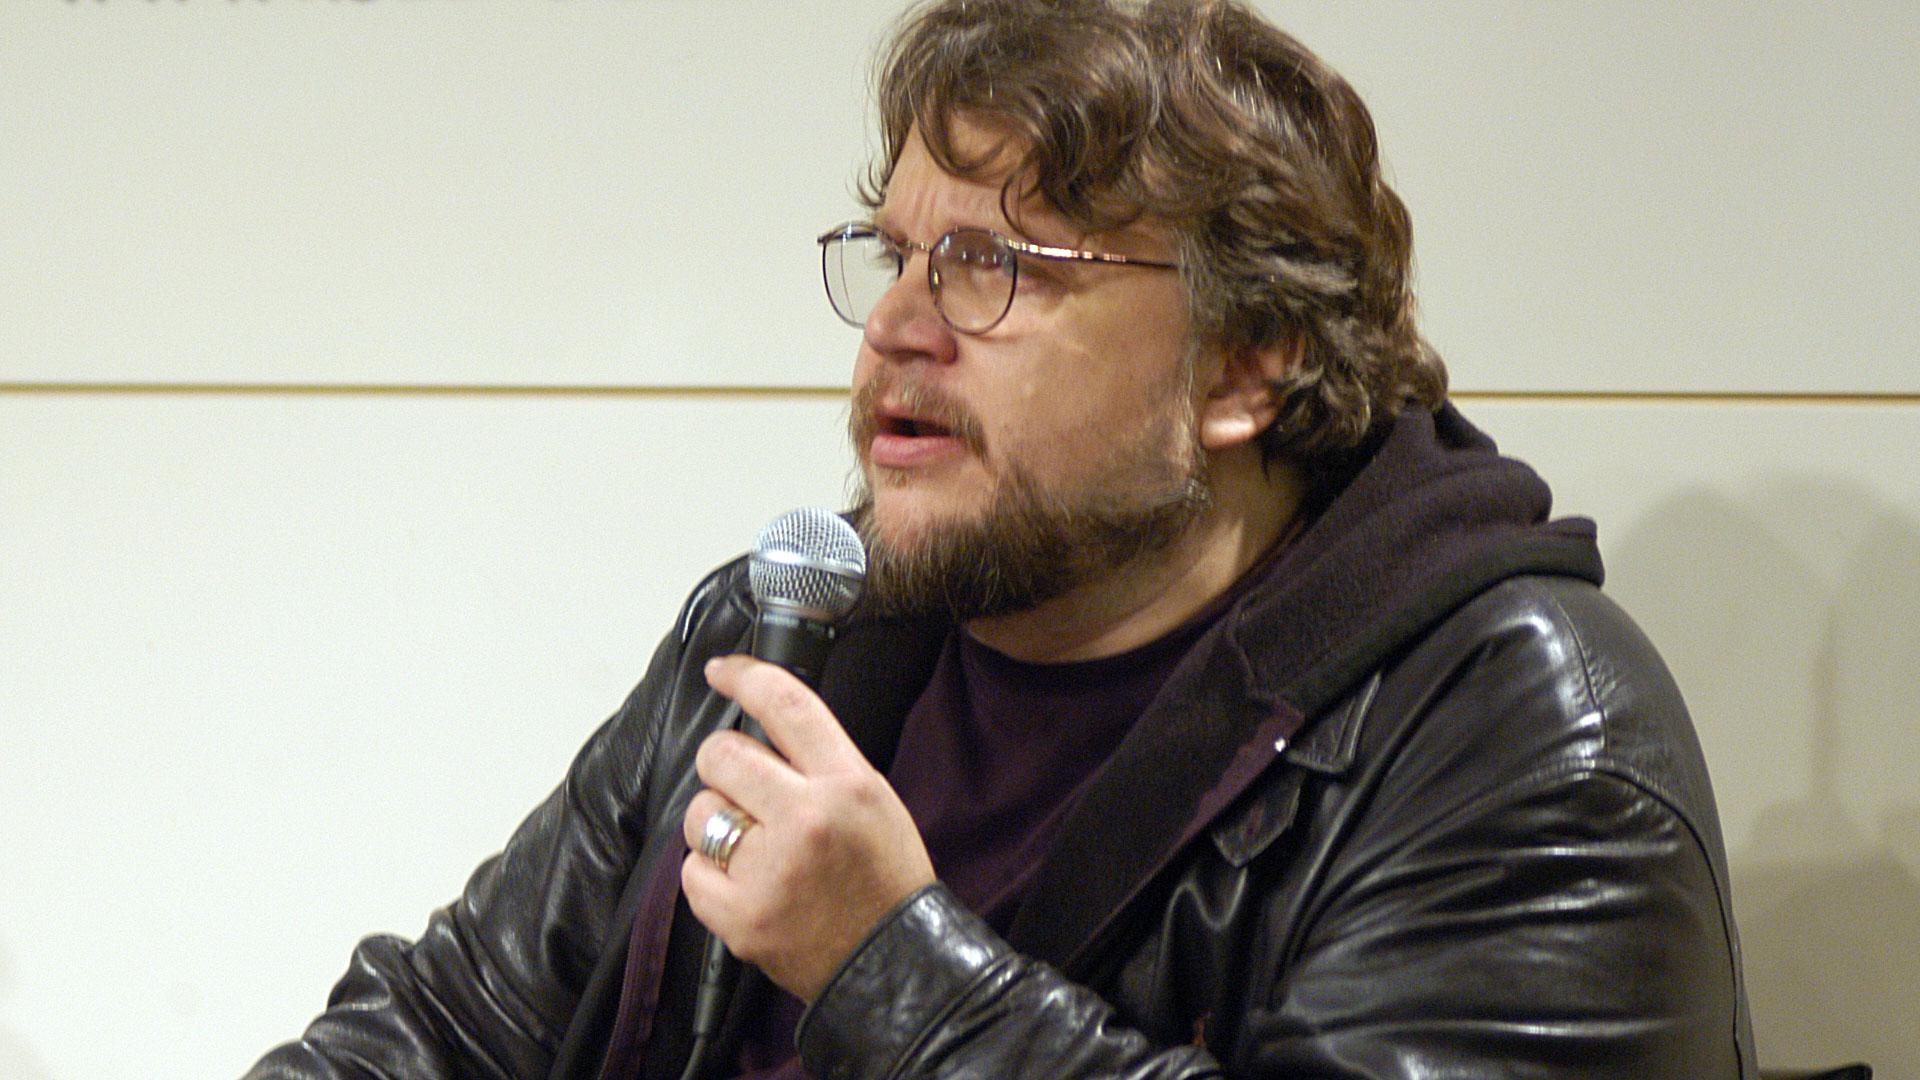 Guillermo del Toro. June 2010, NYC. Photo: Edwin Pagán/LATIN HORROR.